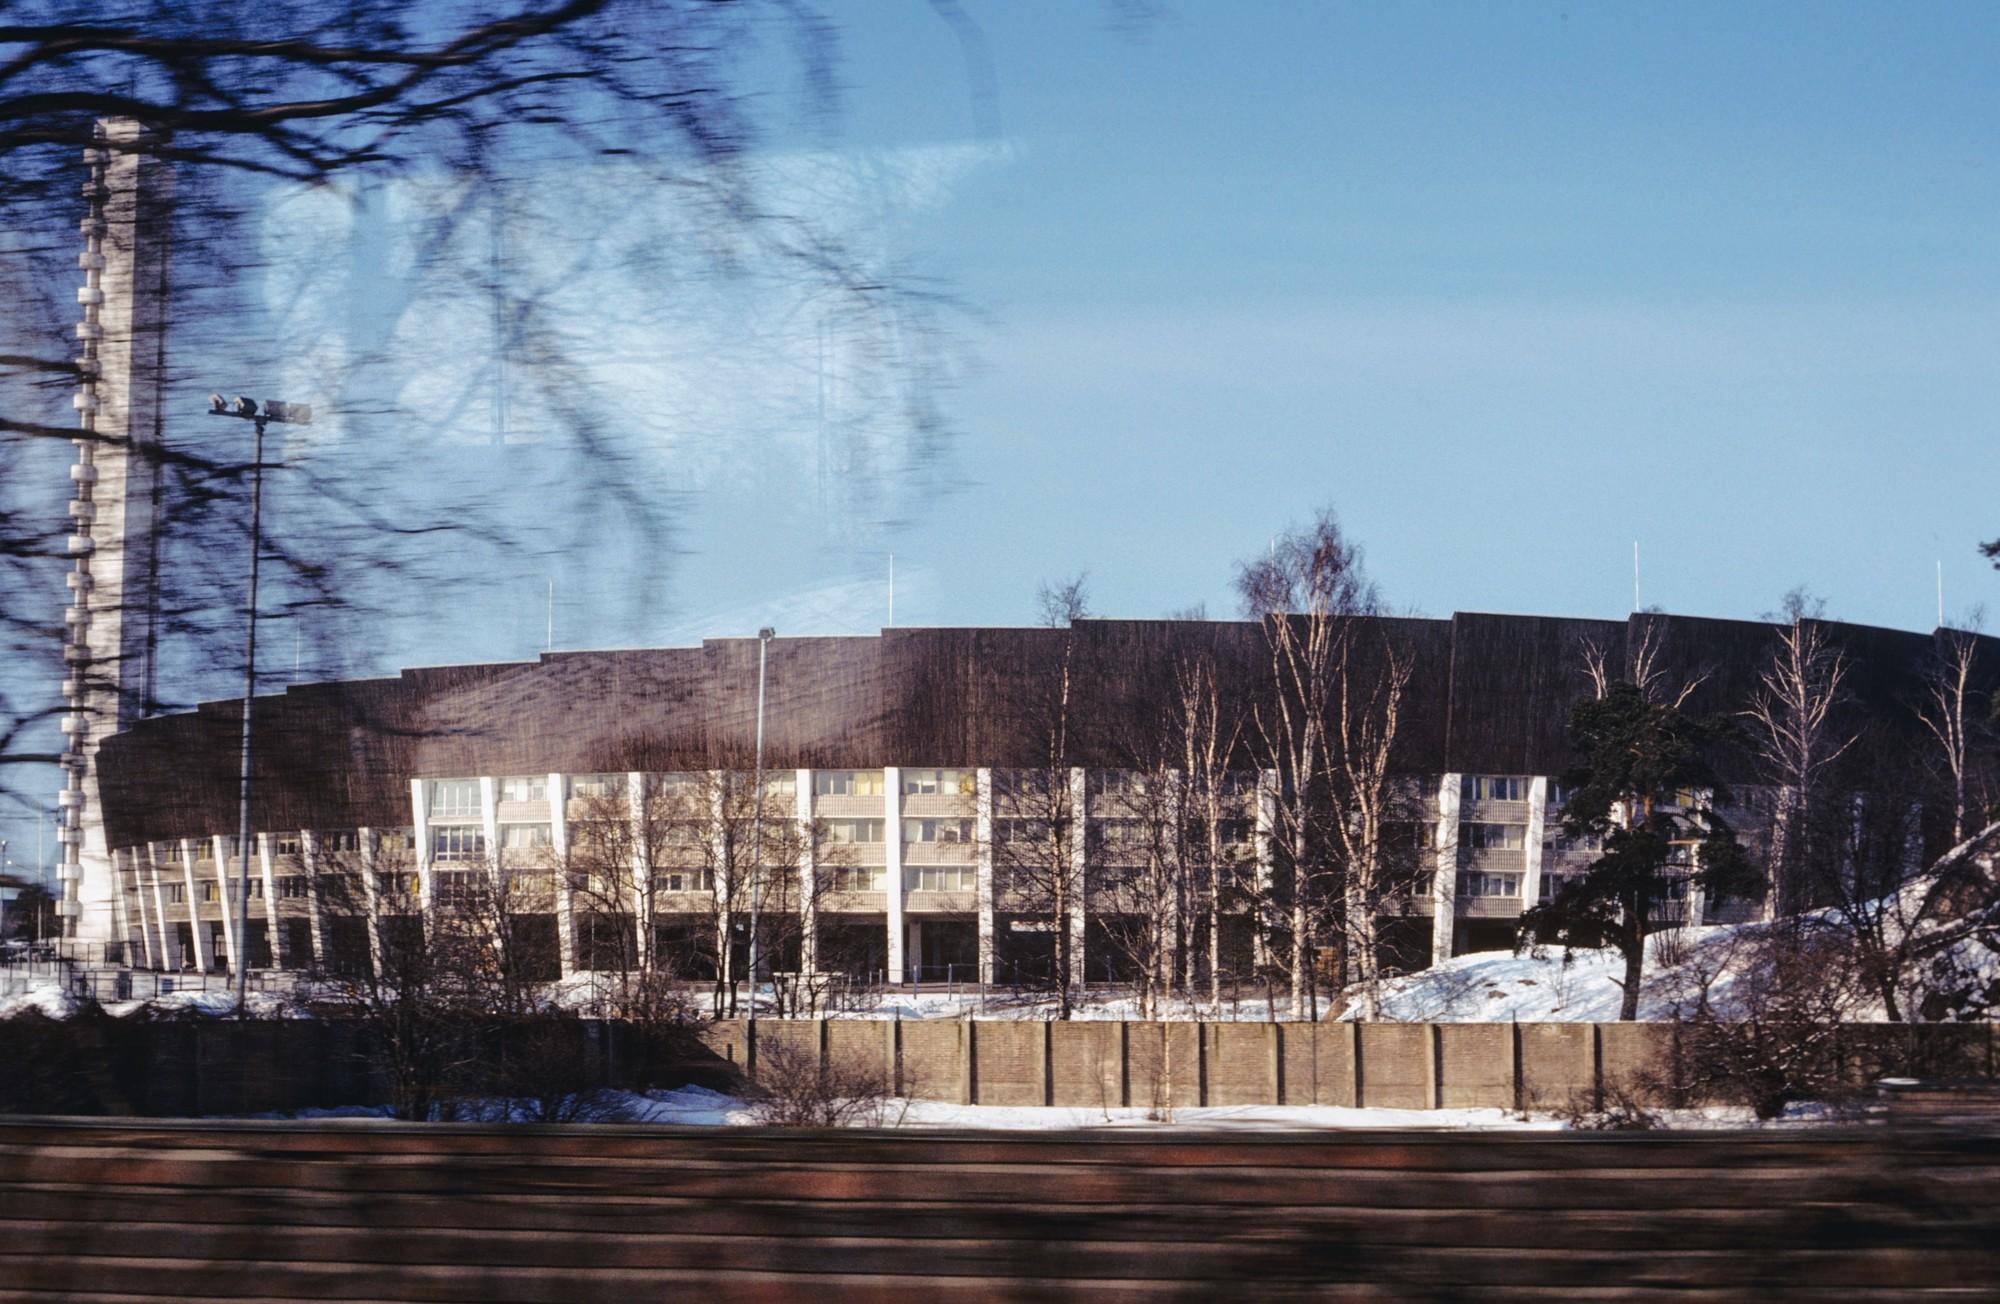 Ms2020_001_BurtonDoug_B1_F8_2_1979_Soviet_Union_003.jpg